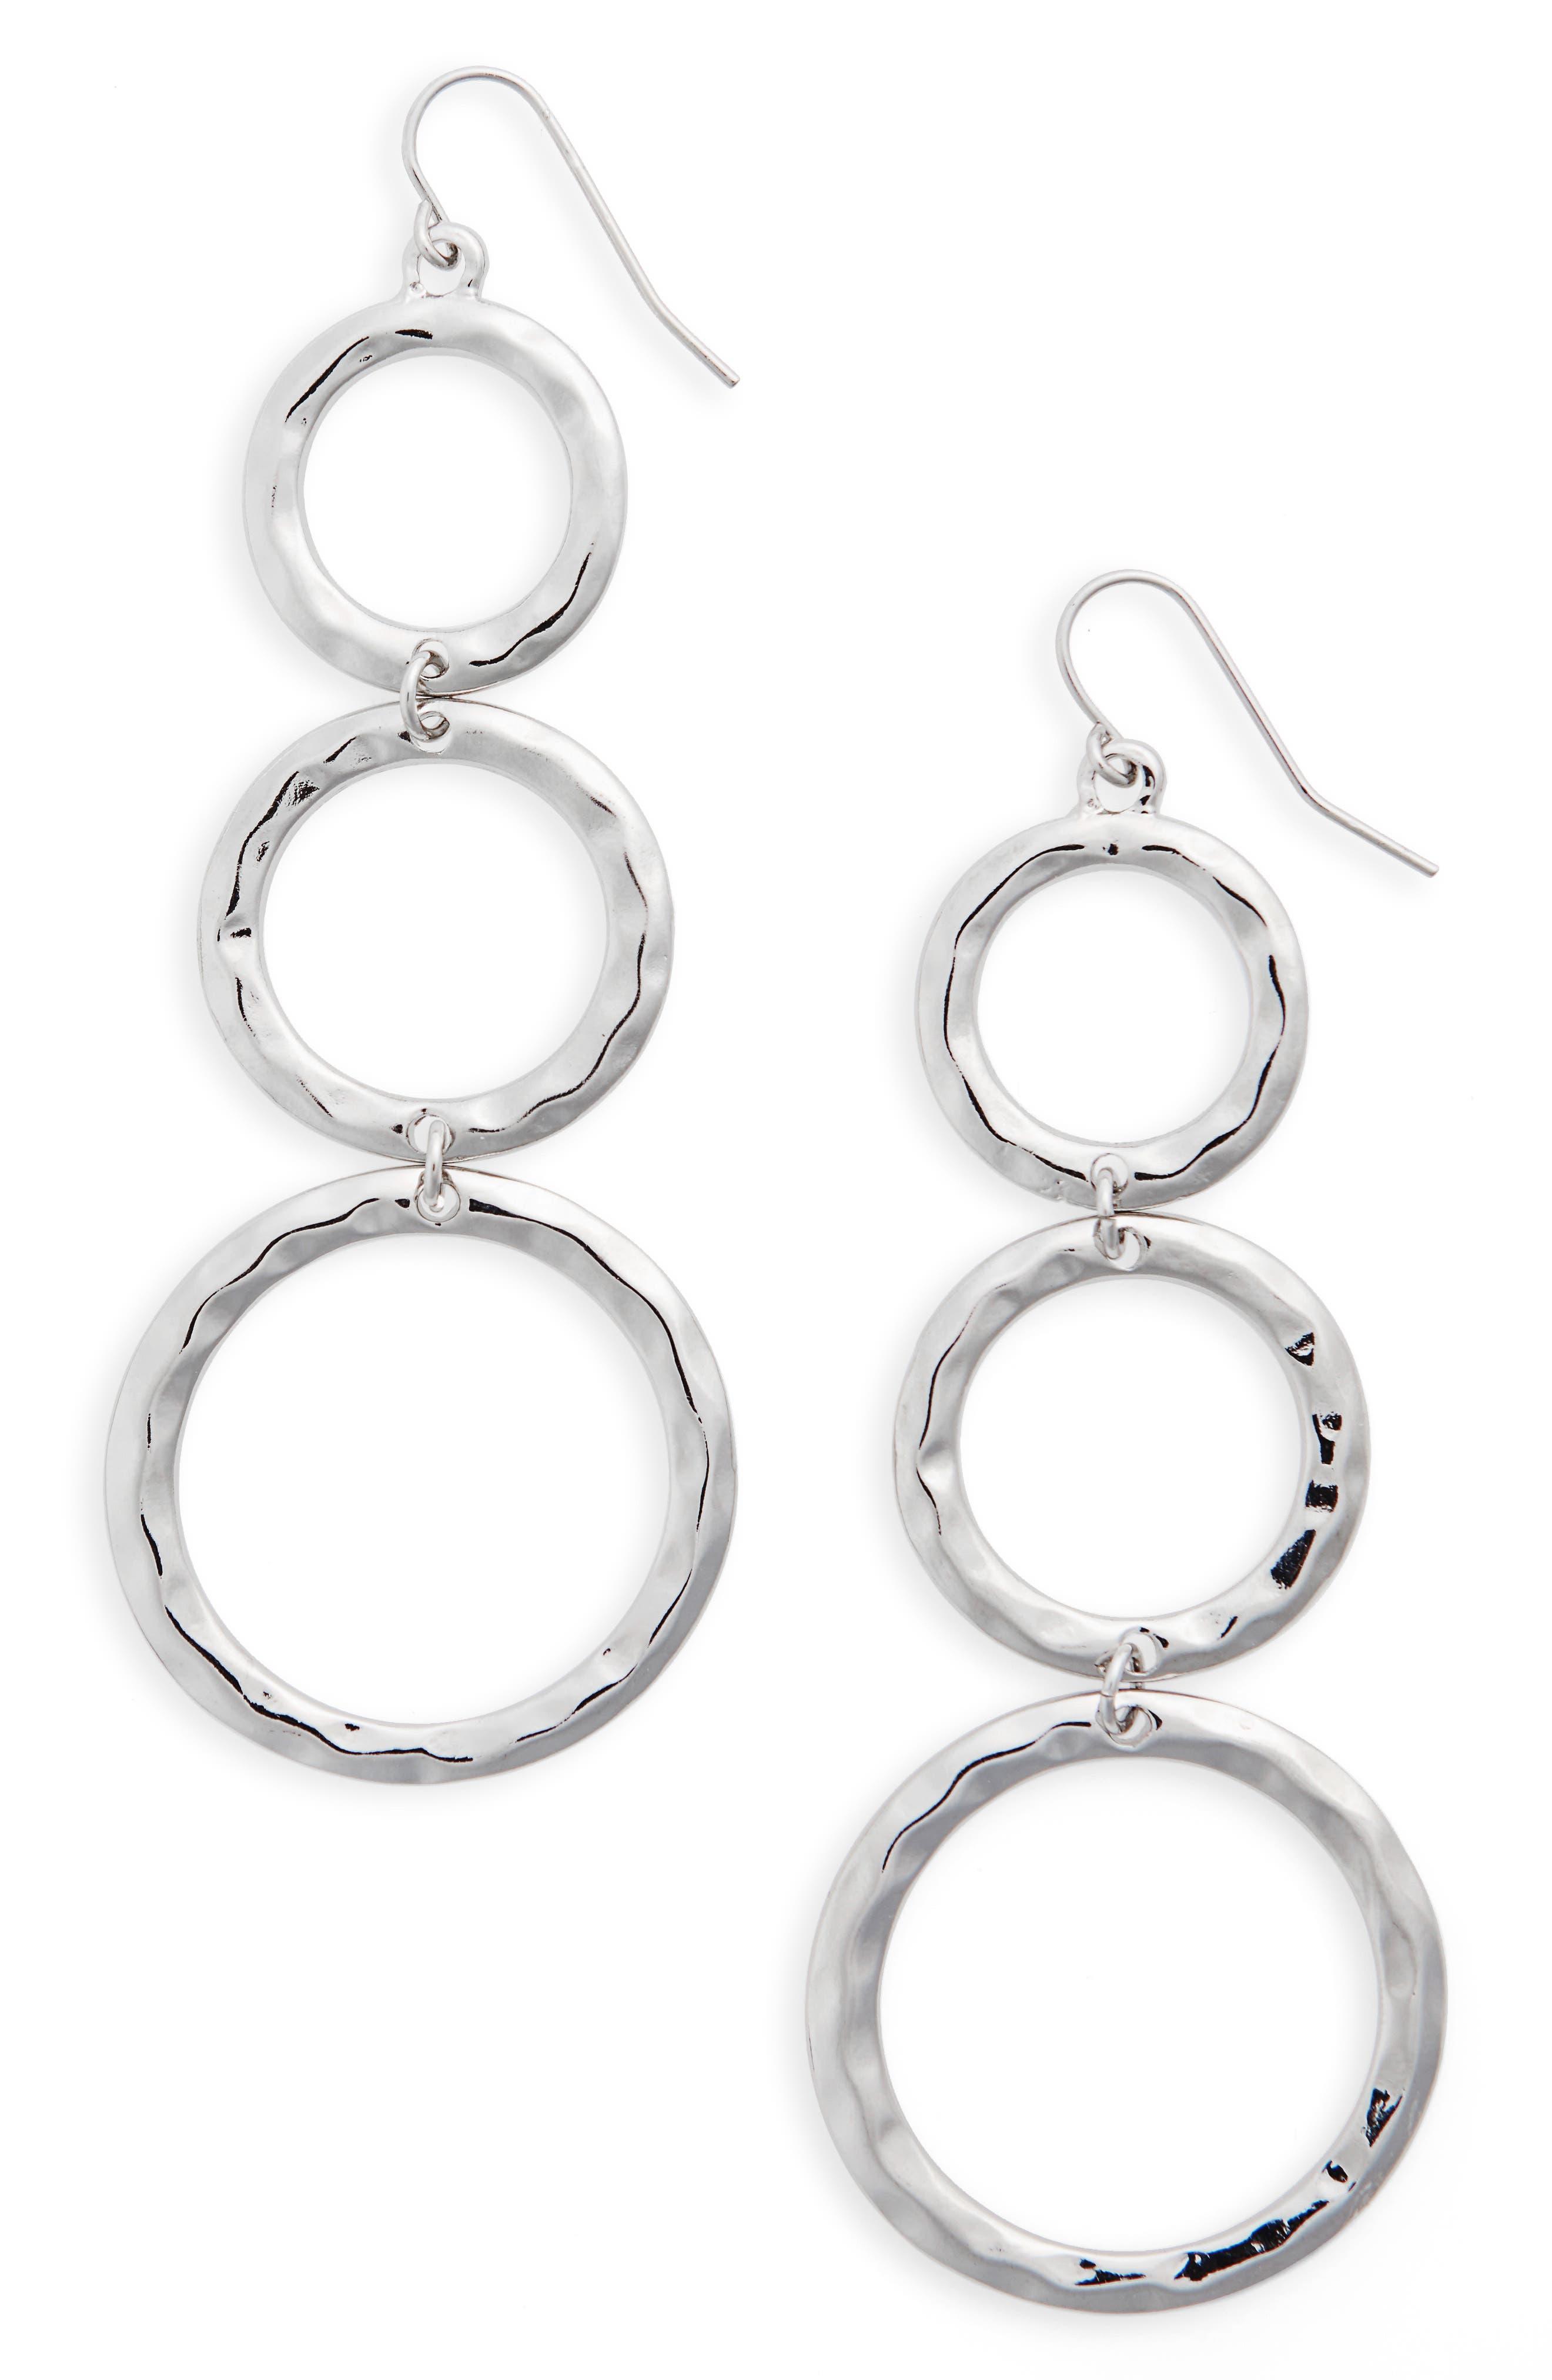 Circle Drop Earrings,                             Main thumbnail 1, color,                             Silver